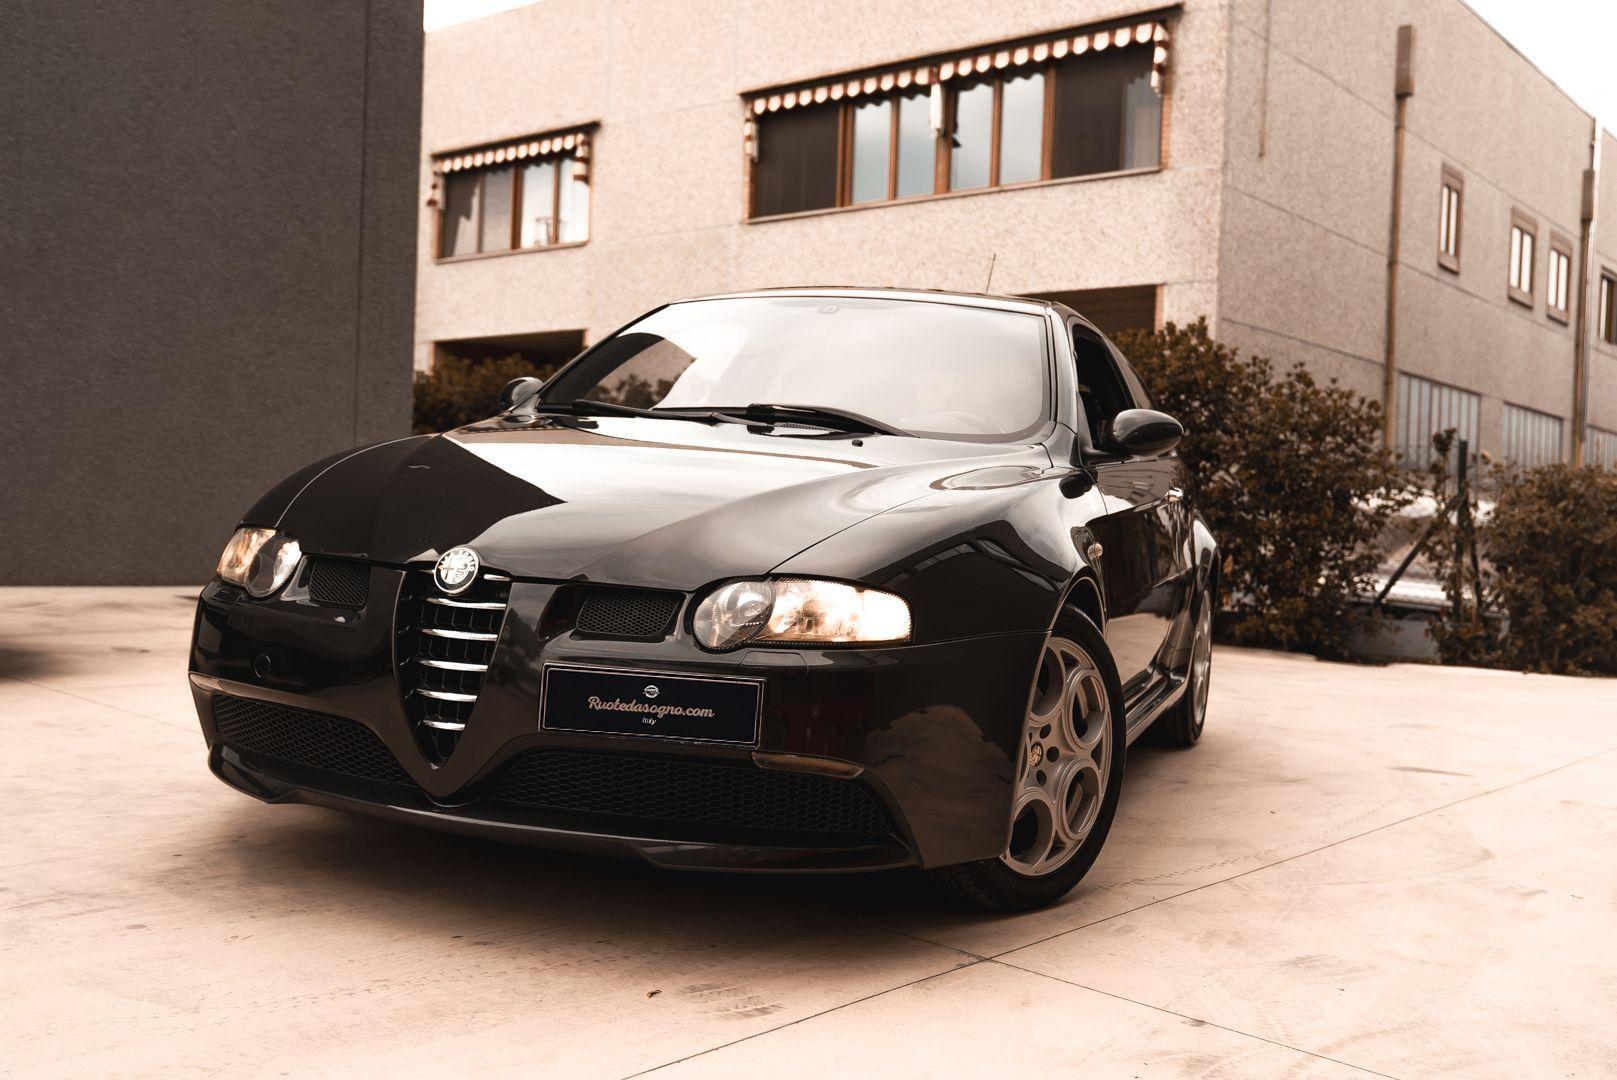 2003 Alfa Romeo 147 GTA 3.2i V6 24V 79569